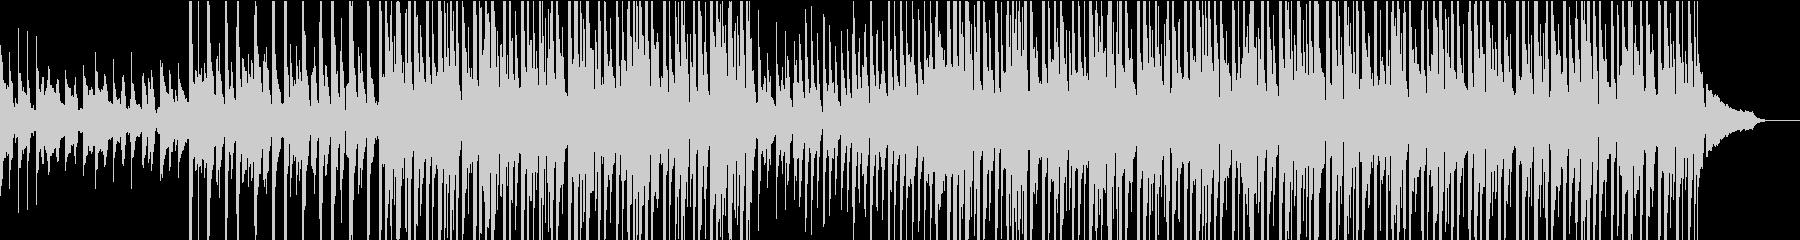 Funk Musicの未再生の波形